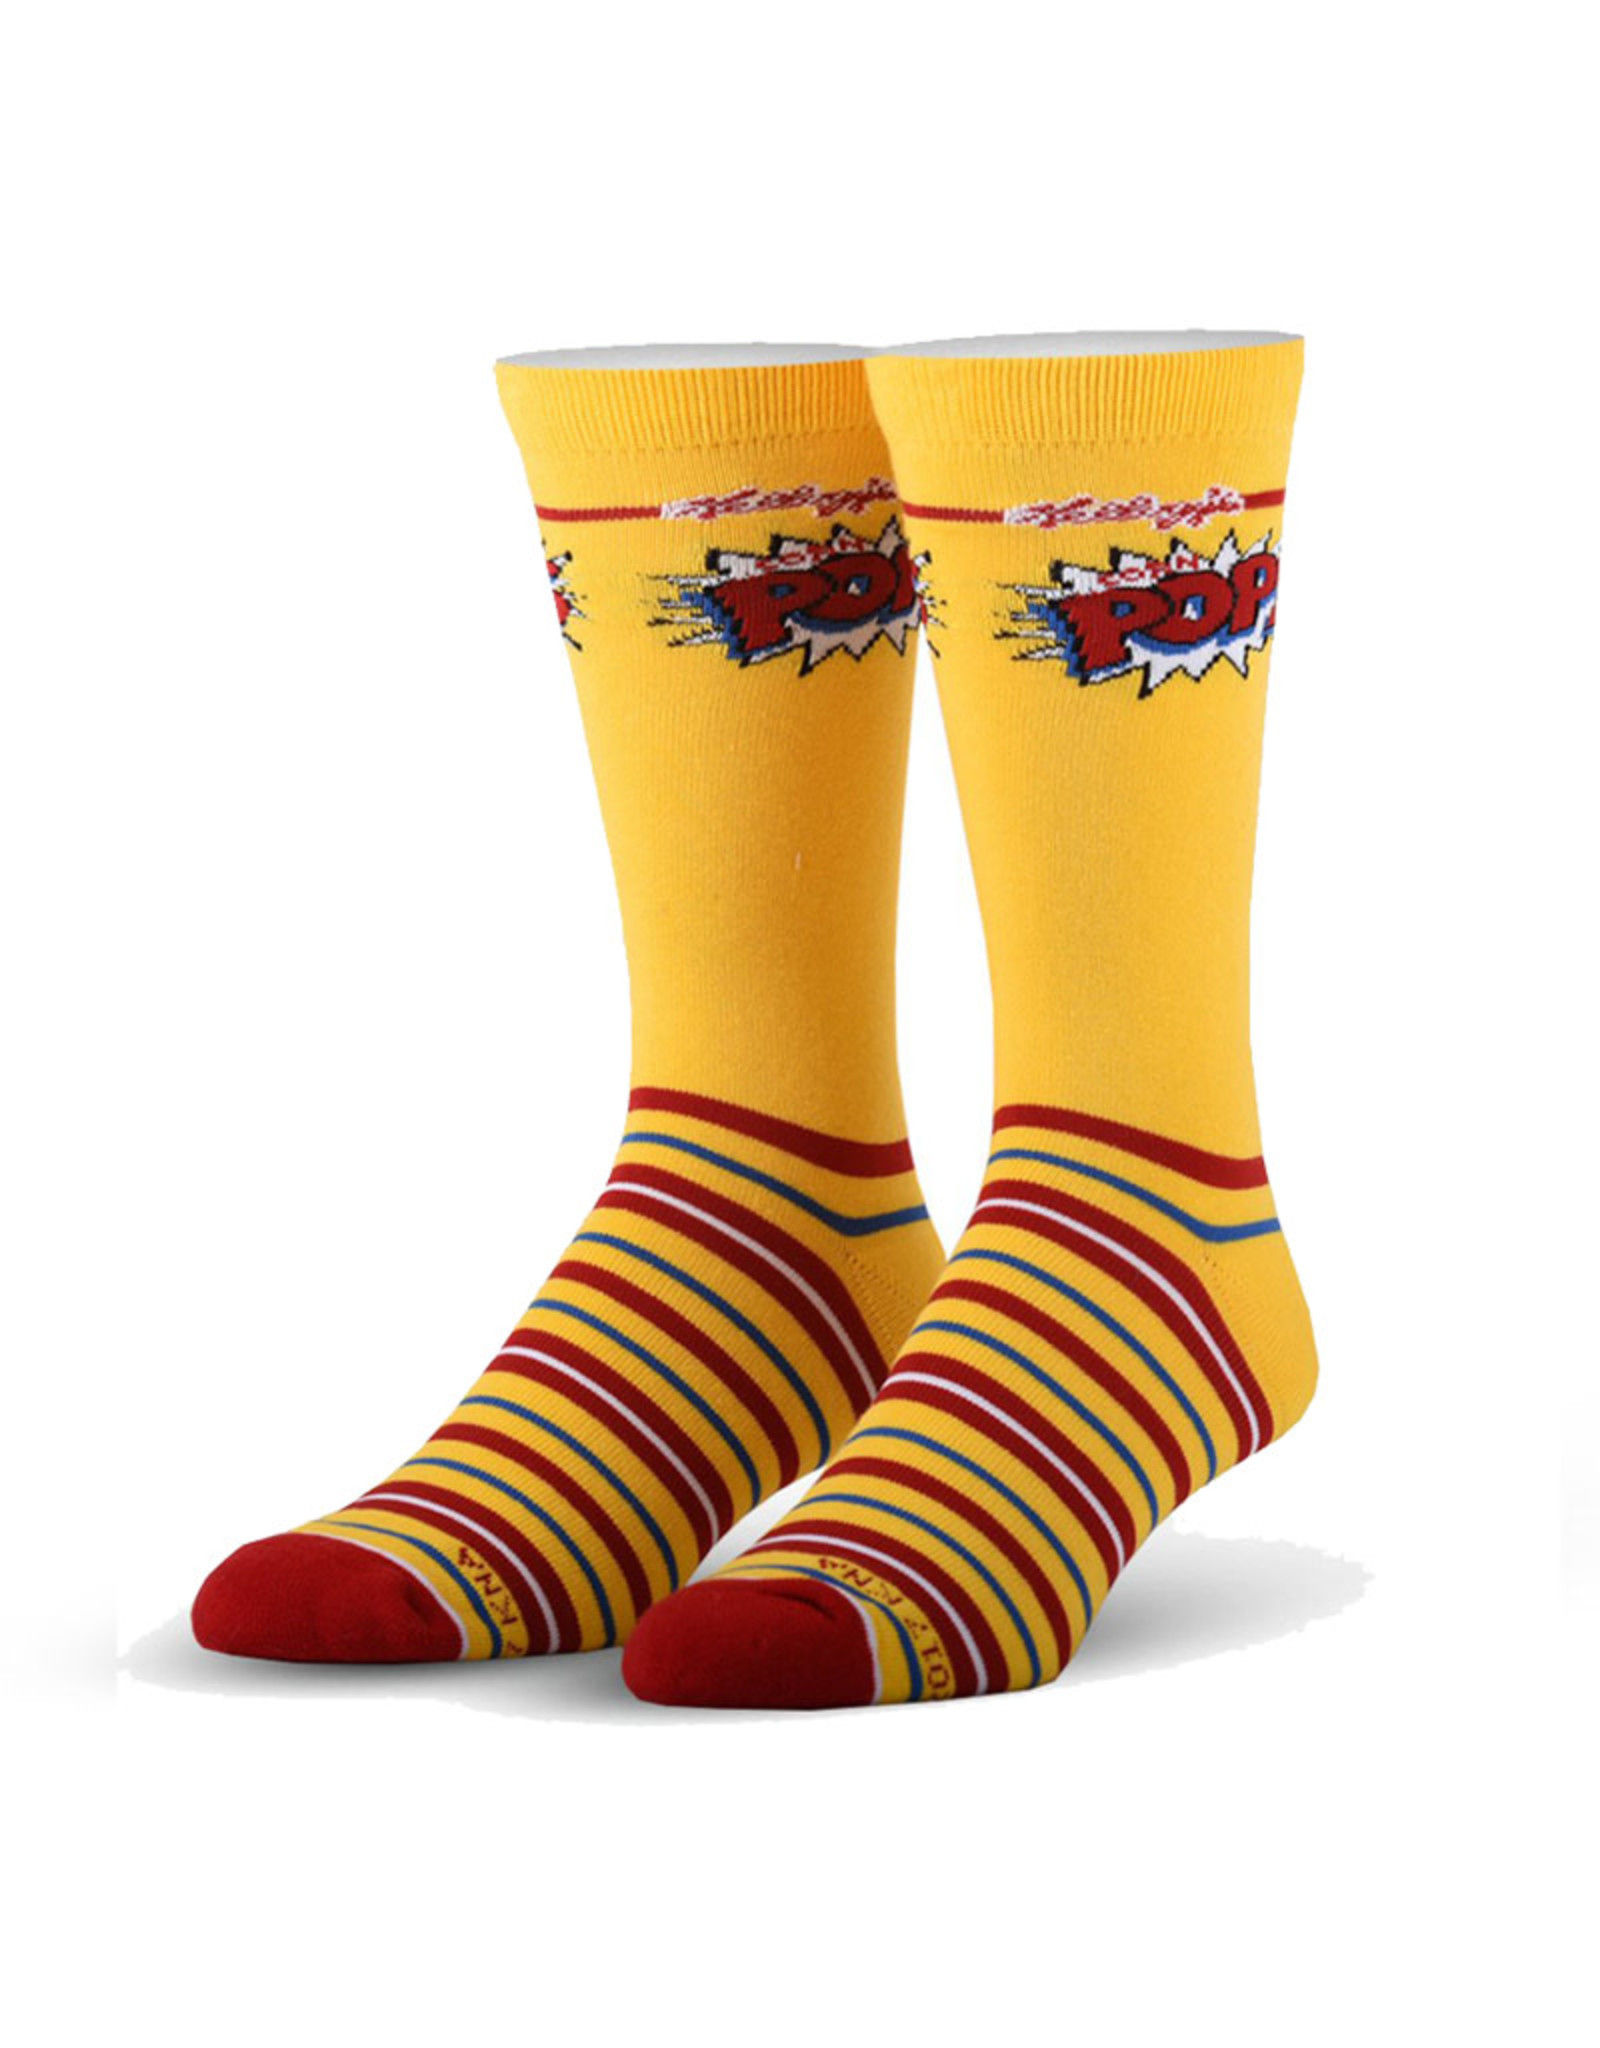 Kellogg's ( Bas Cool Socks ) Corn  Pops